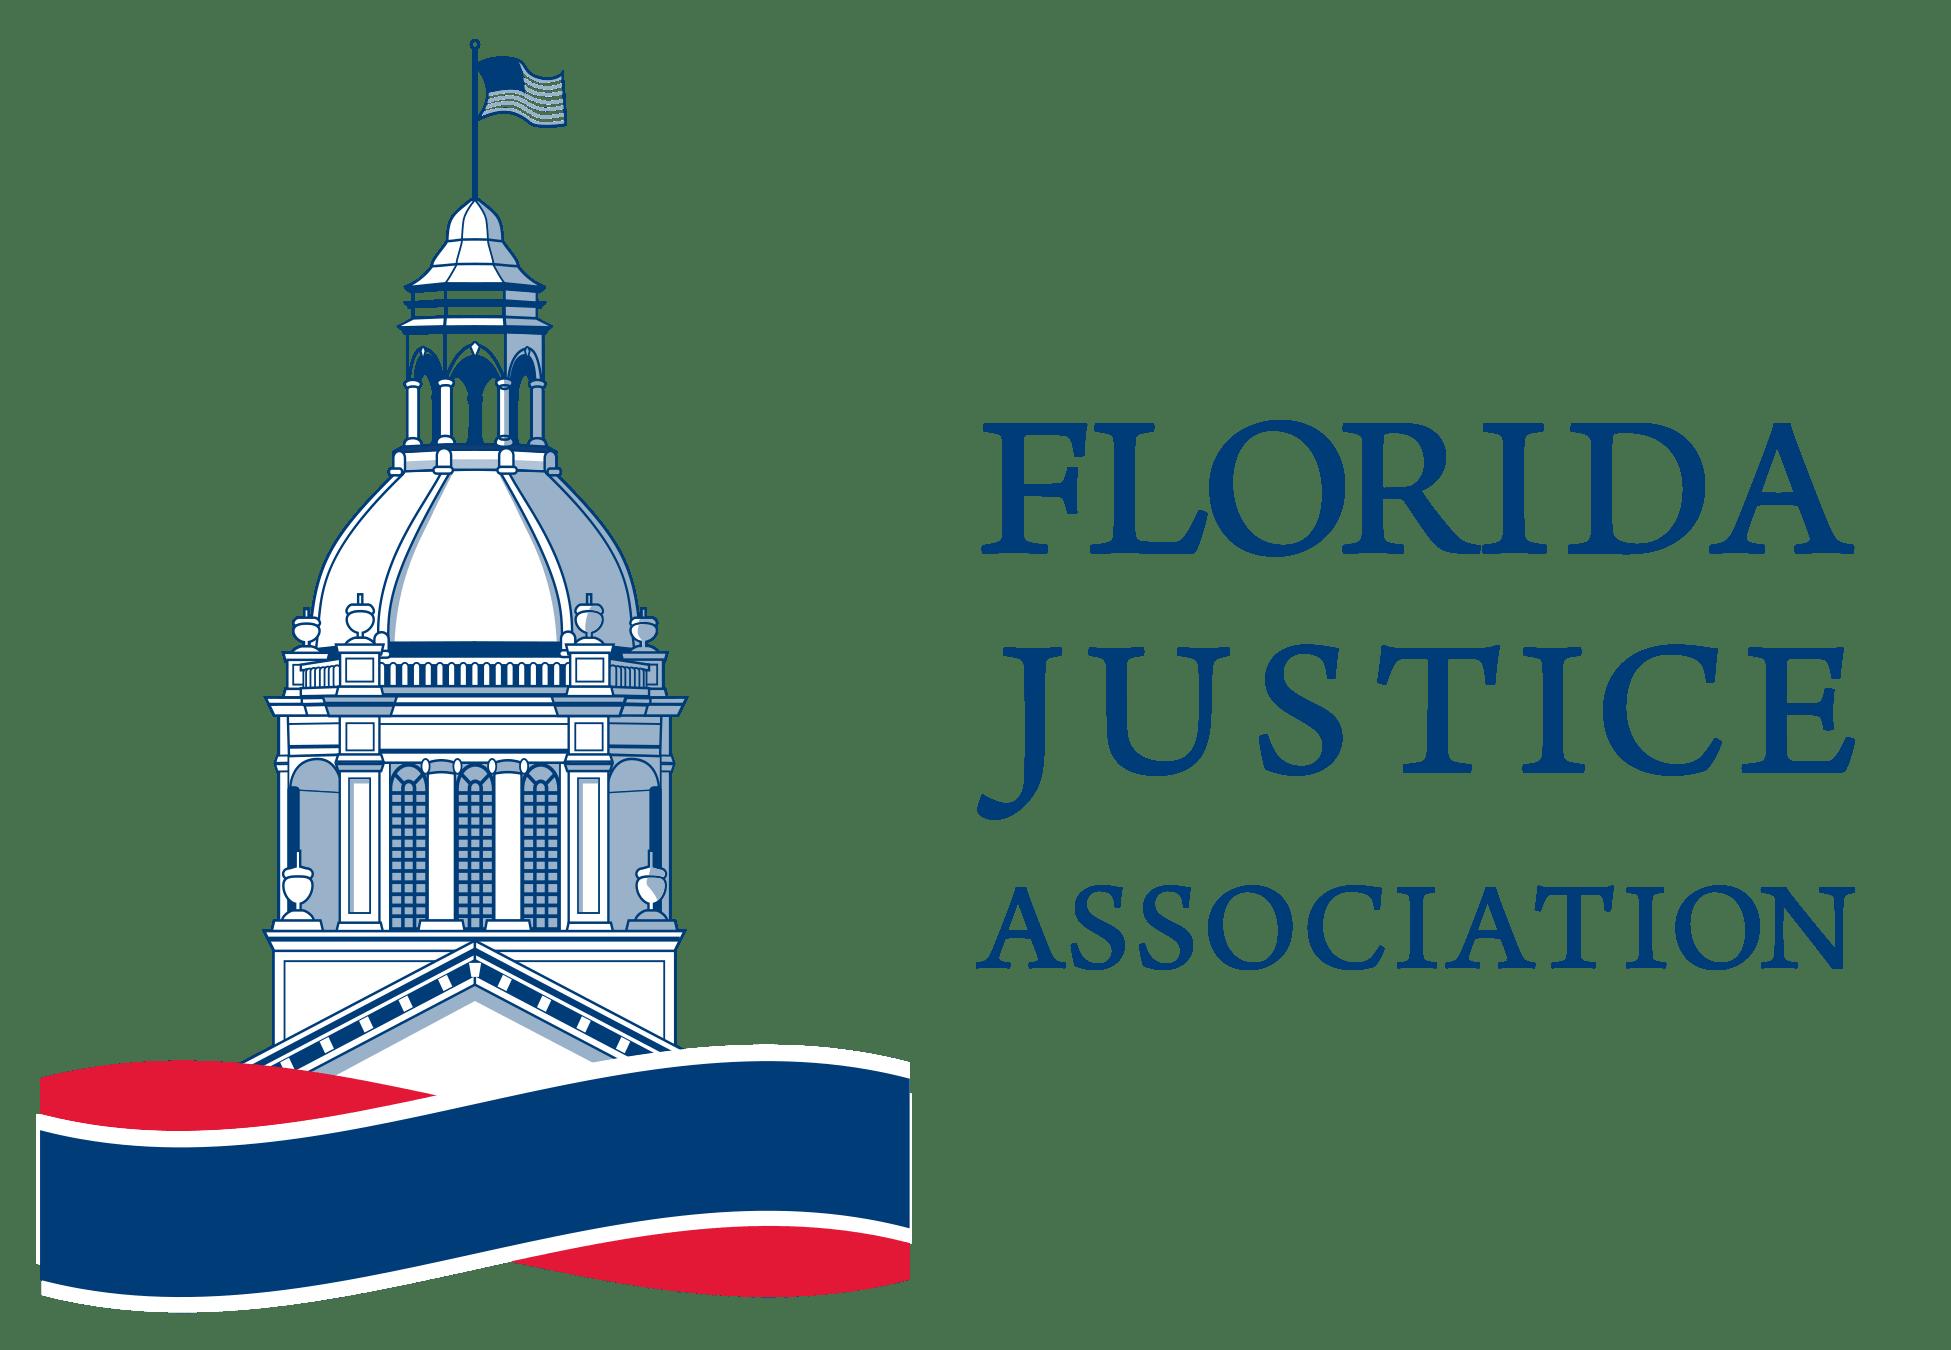 florida justice association logo